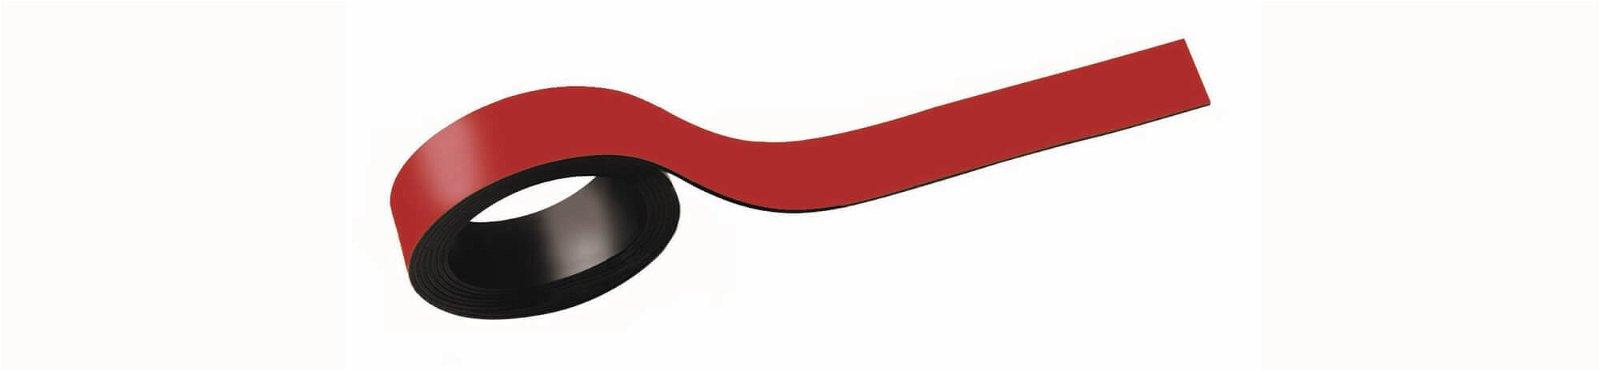 Magnetstreifen, 1,5x100 cm, 2 St./Set, rot